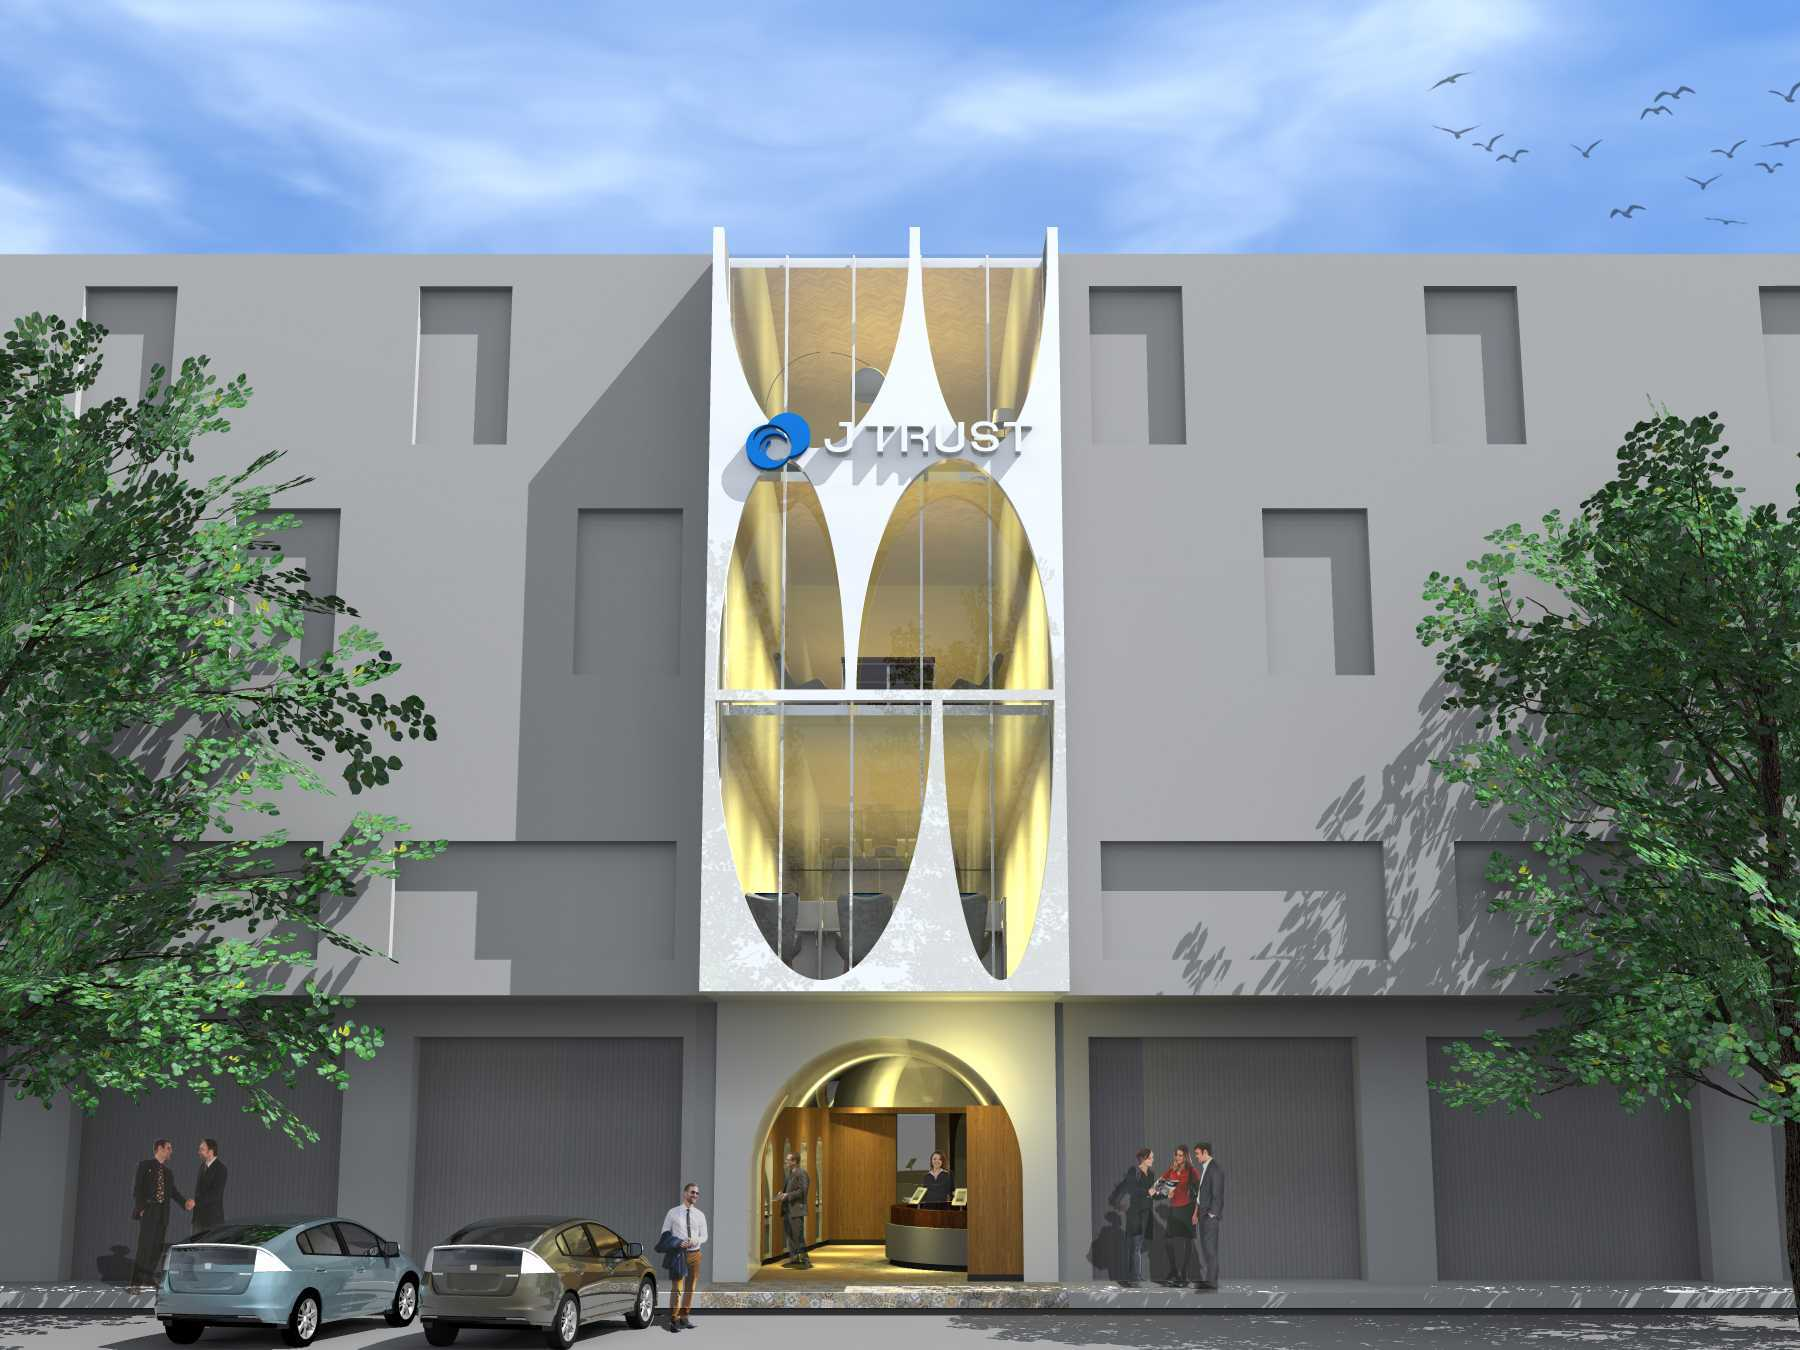 Monokroma Architect J Trust Bank Facade Jakarta Jakarta 16-Alternative-4-1 Modern  14896